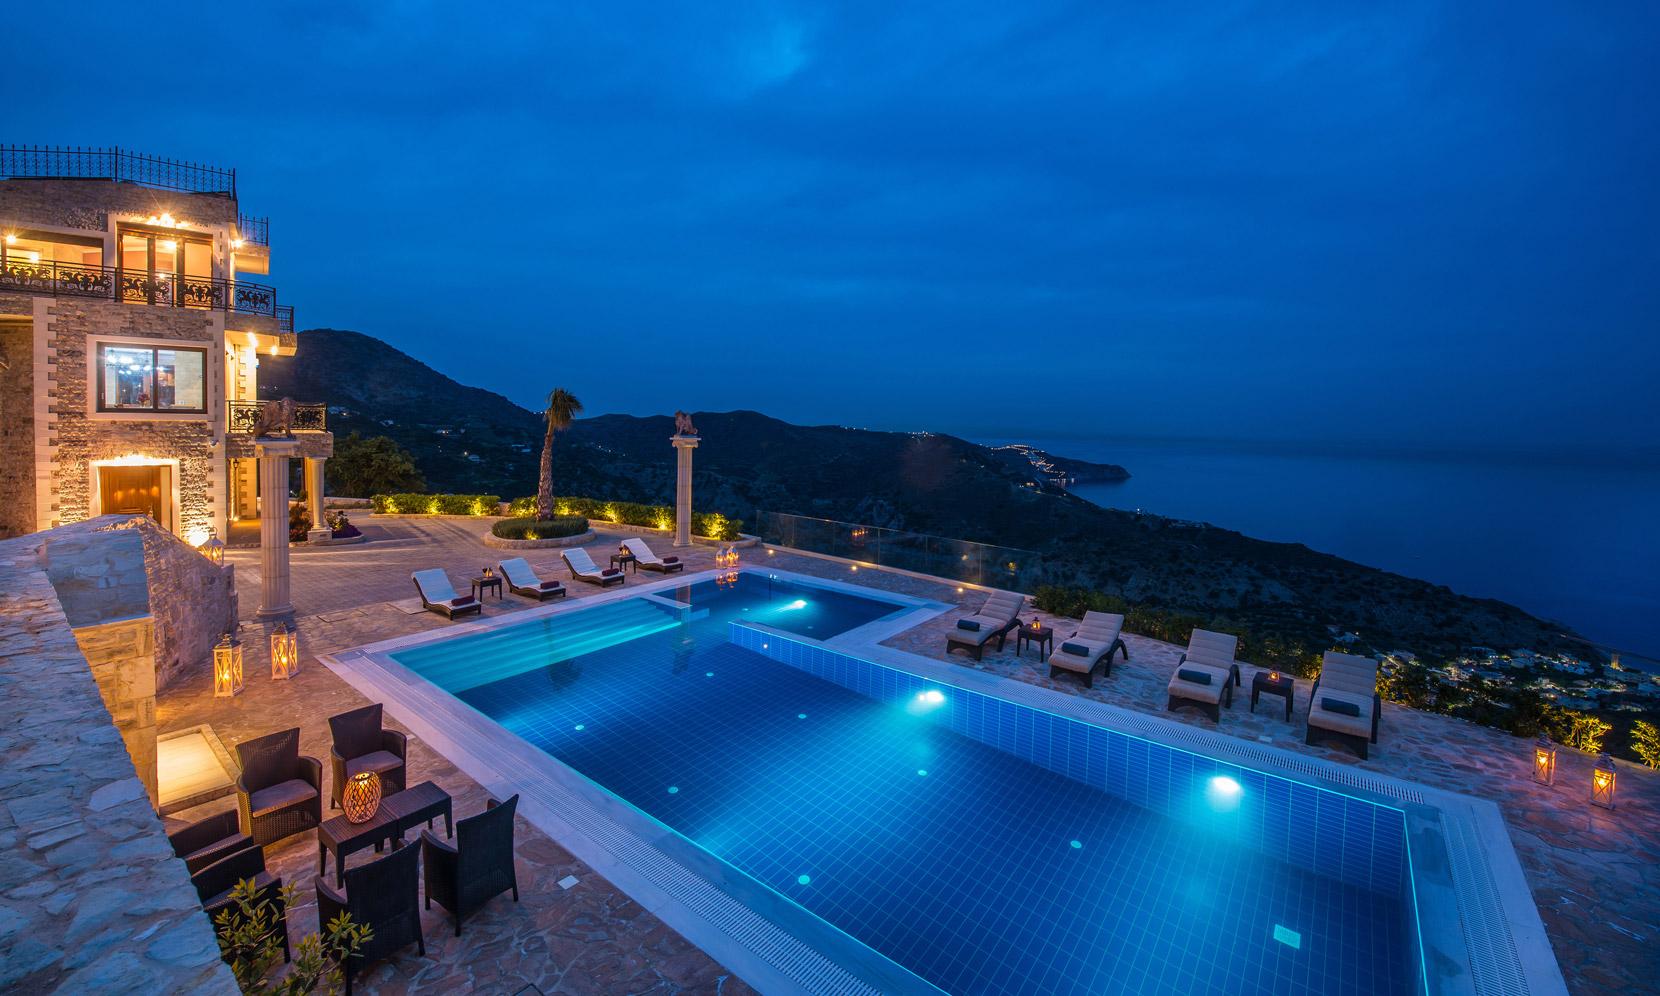 Crete Villa Laura jumbotron image